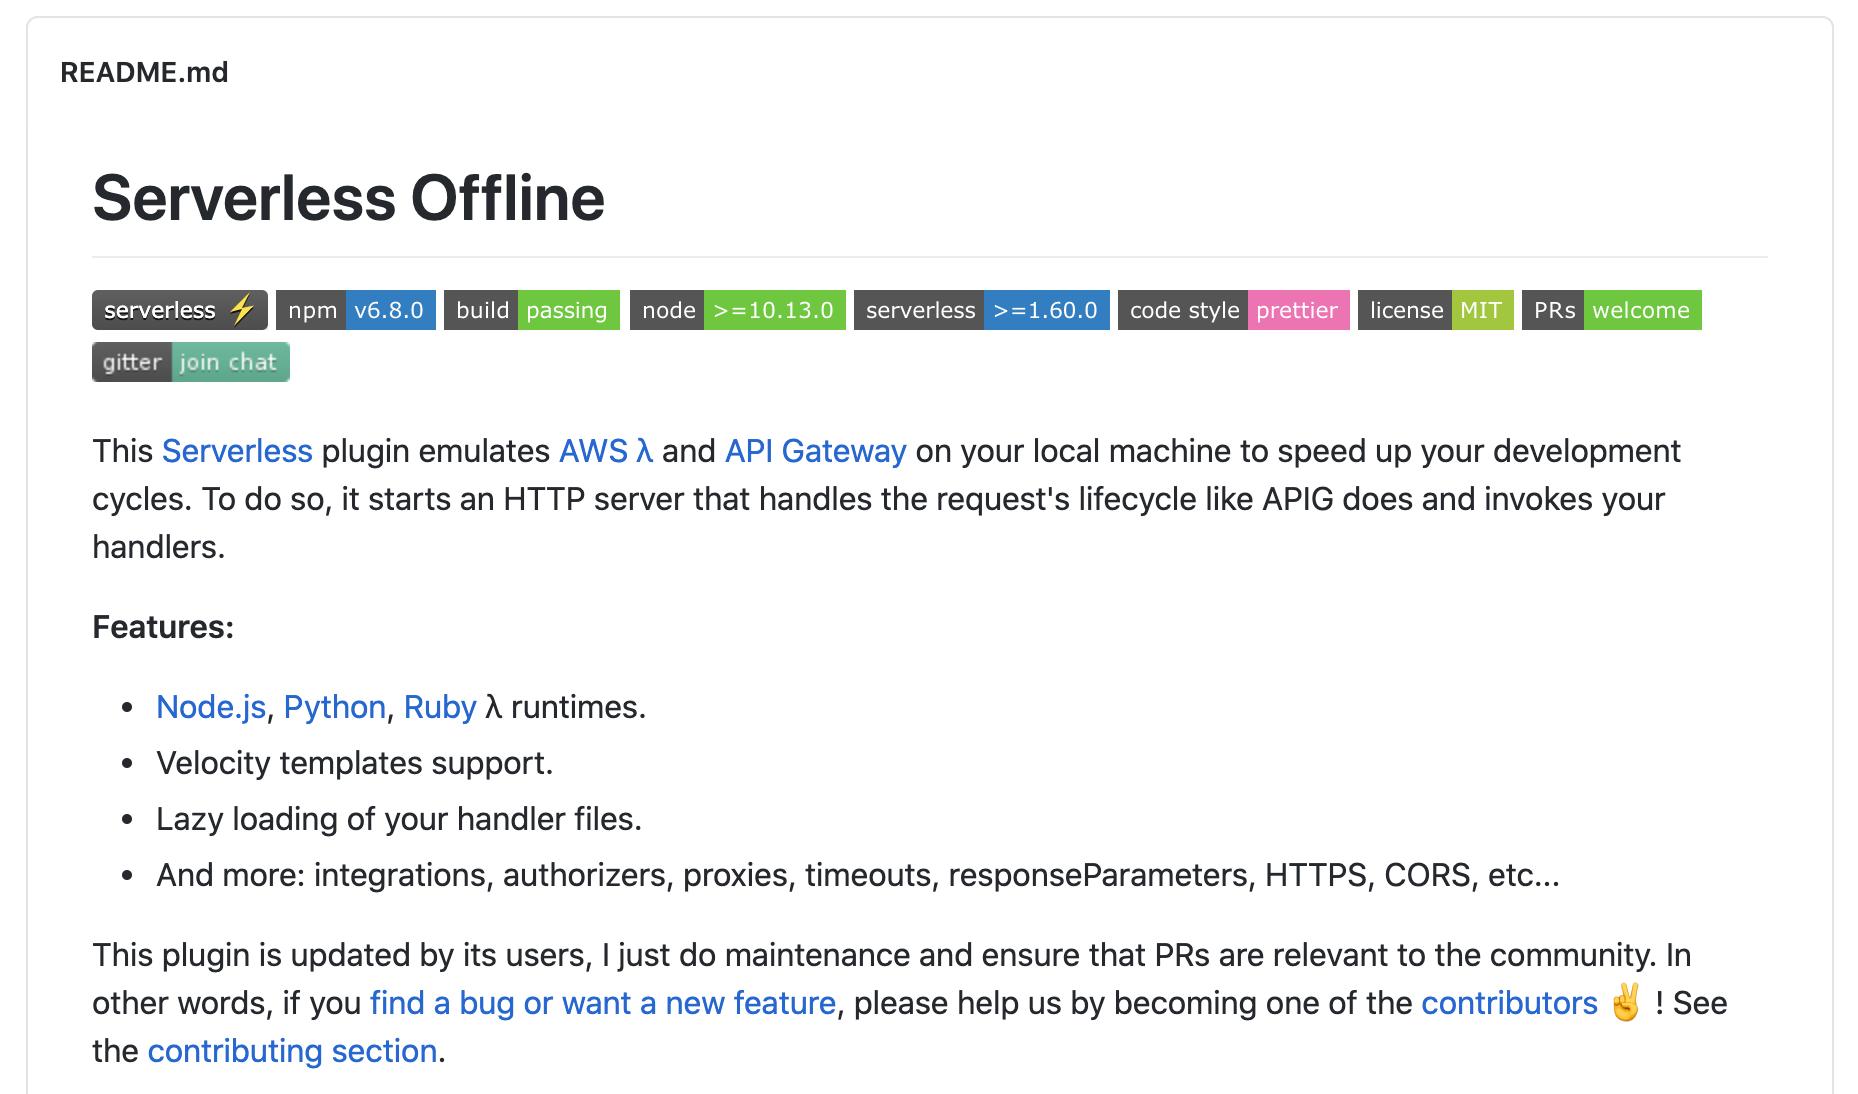 serverless-offline